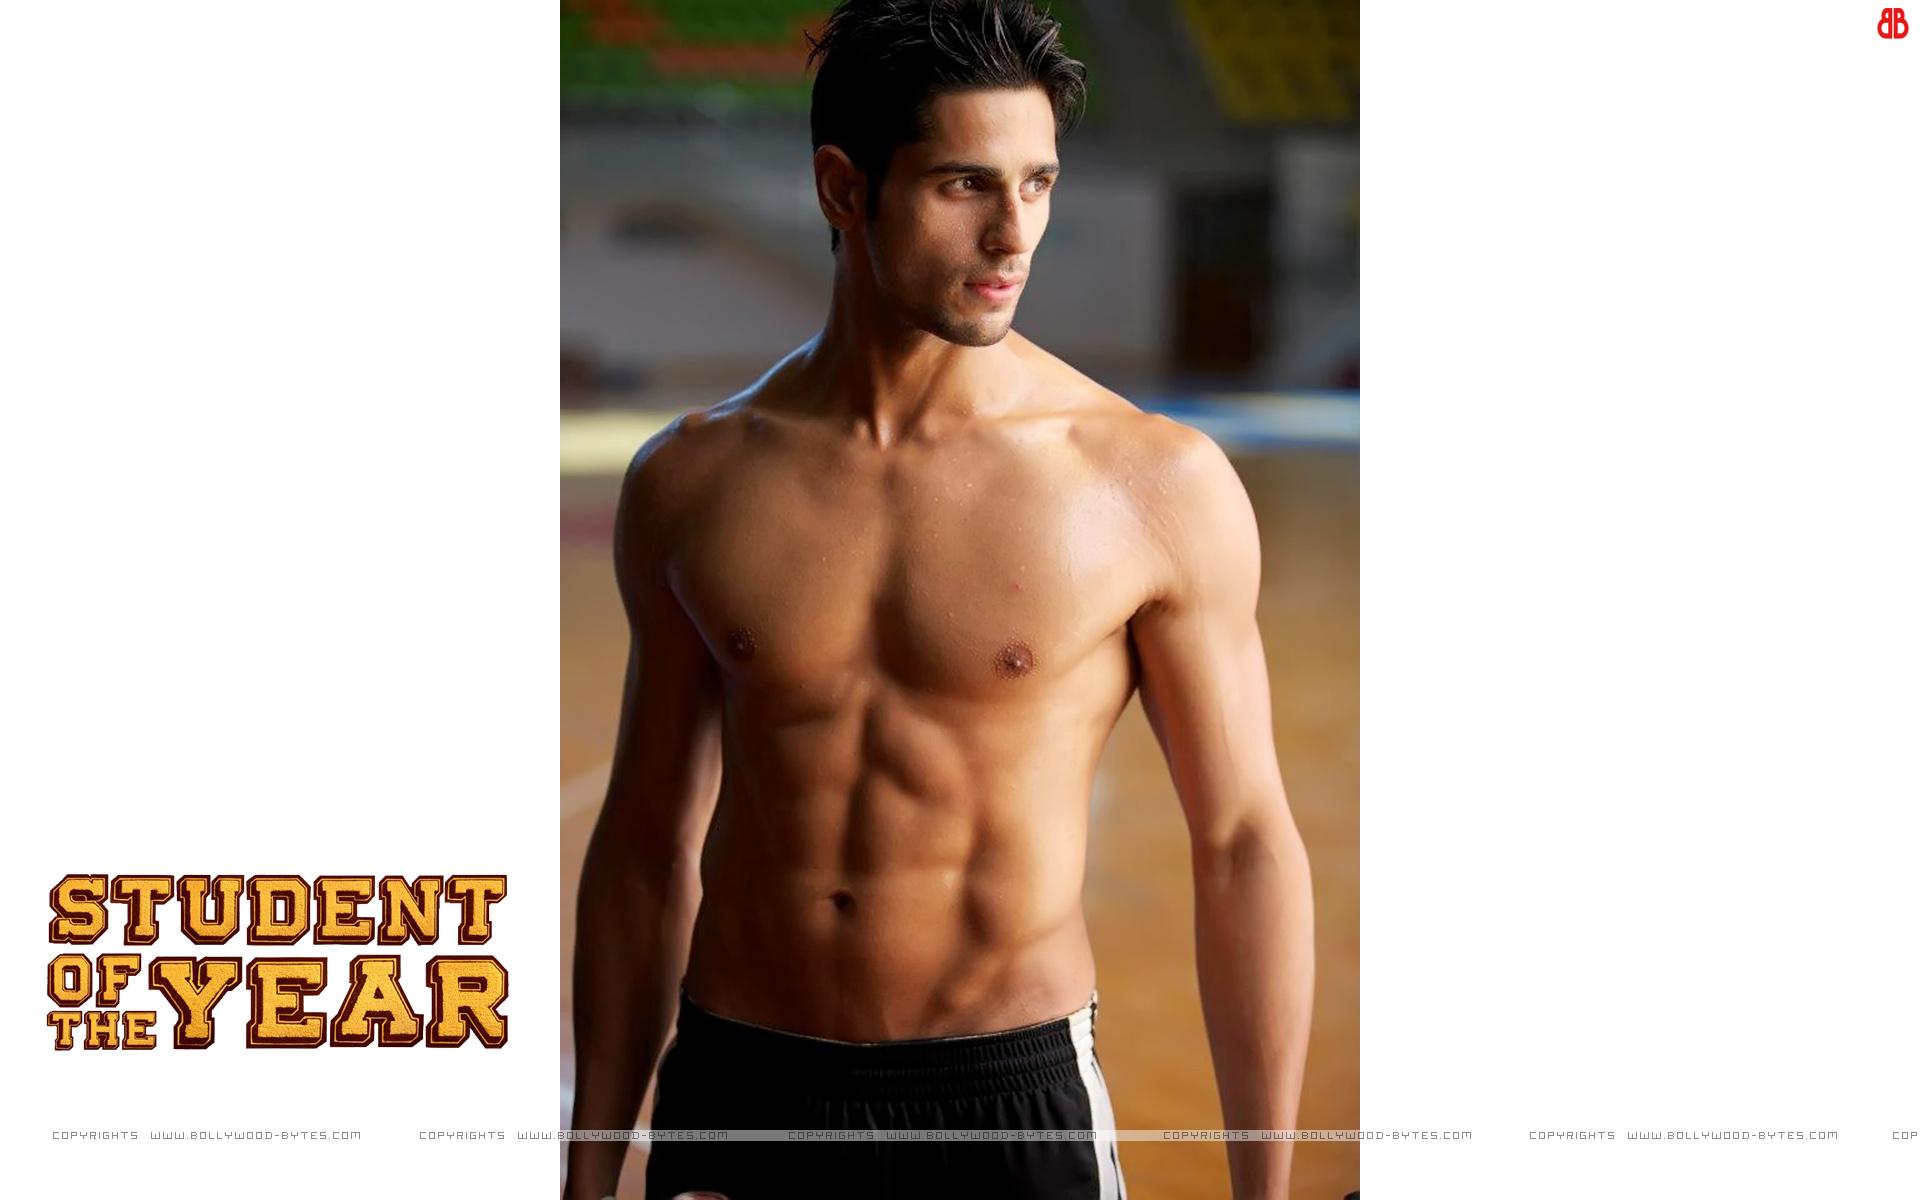 http://3.bp.blogspot.com/-WFwY0VtXC-Y/UGtFoA2Vd0I/AAAAAAAAQe8/hdrIdUhGHEQ/s1920/Student-Of-The-Year-+Muscular-Sidharth-Malhotra-HD-Wallaper-21.jpg